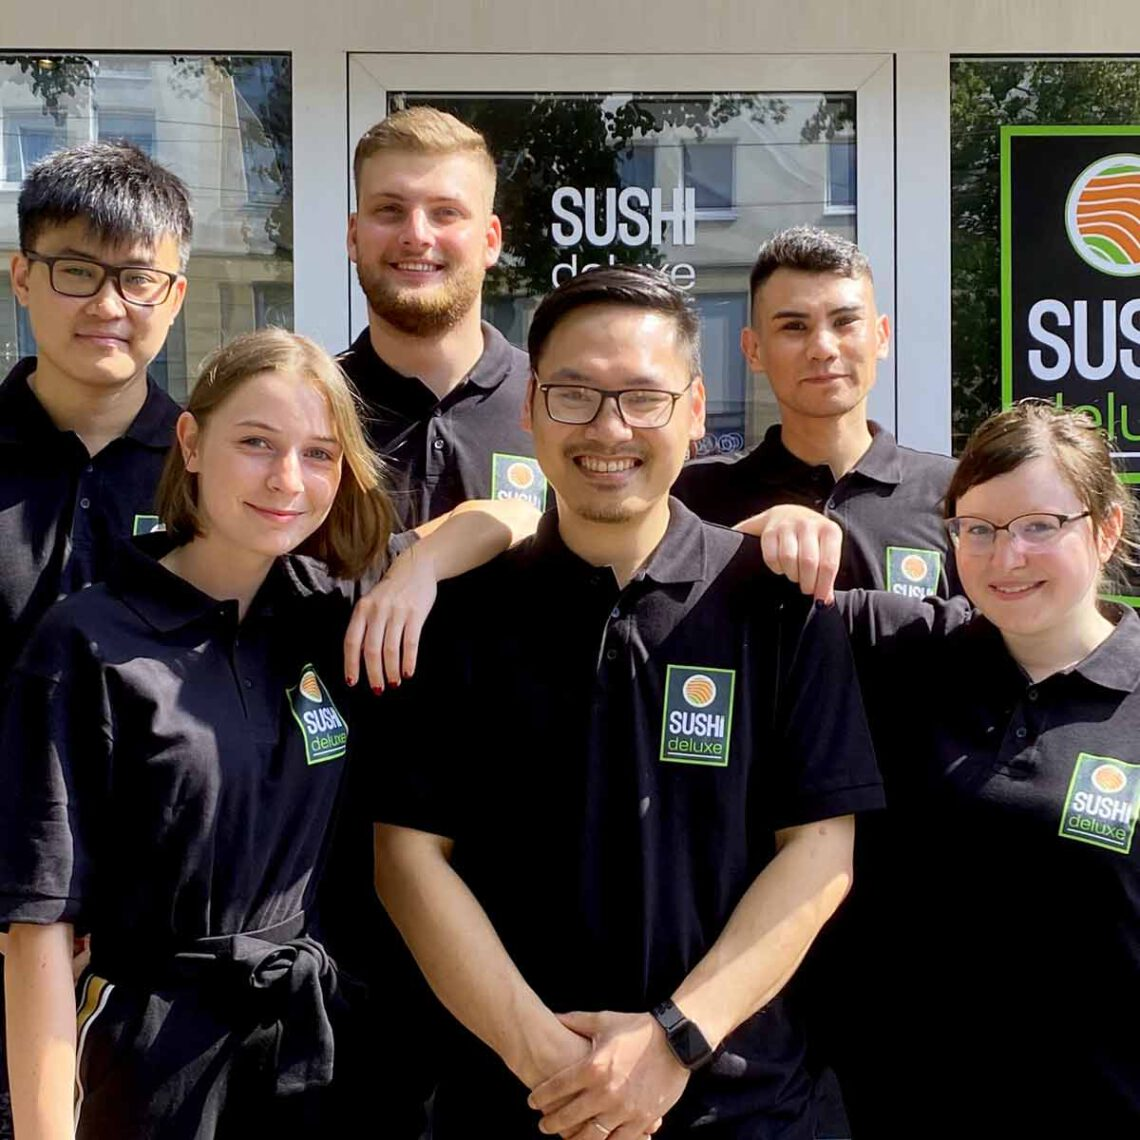 Das SUSHIdeluxe Team in Magdeburg